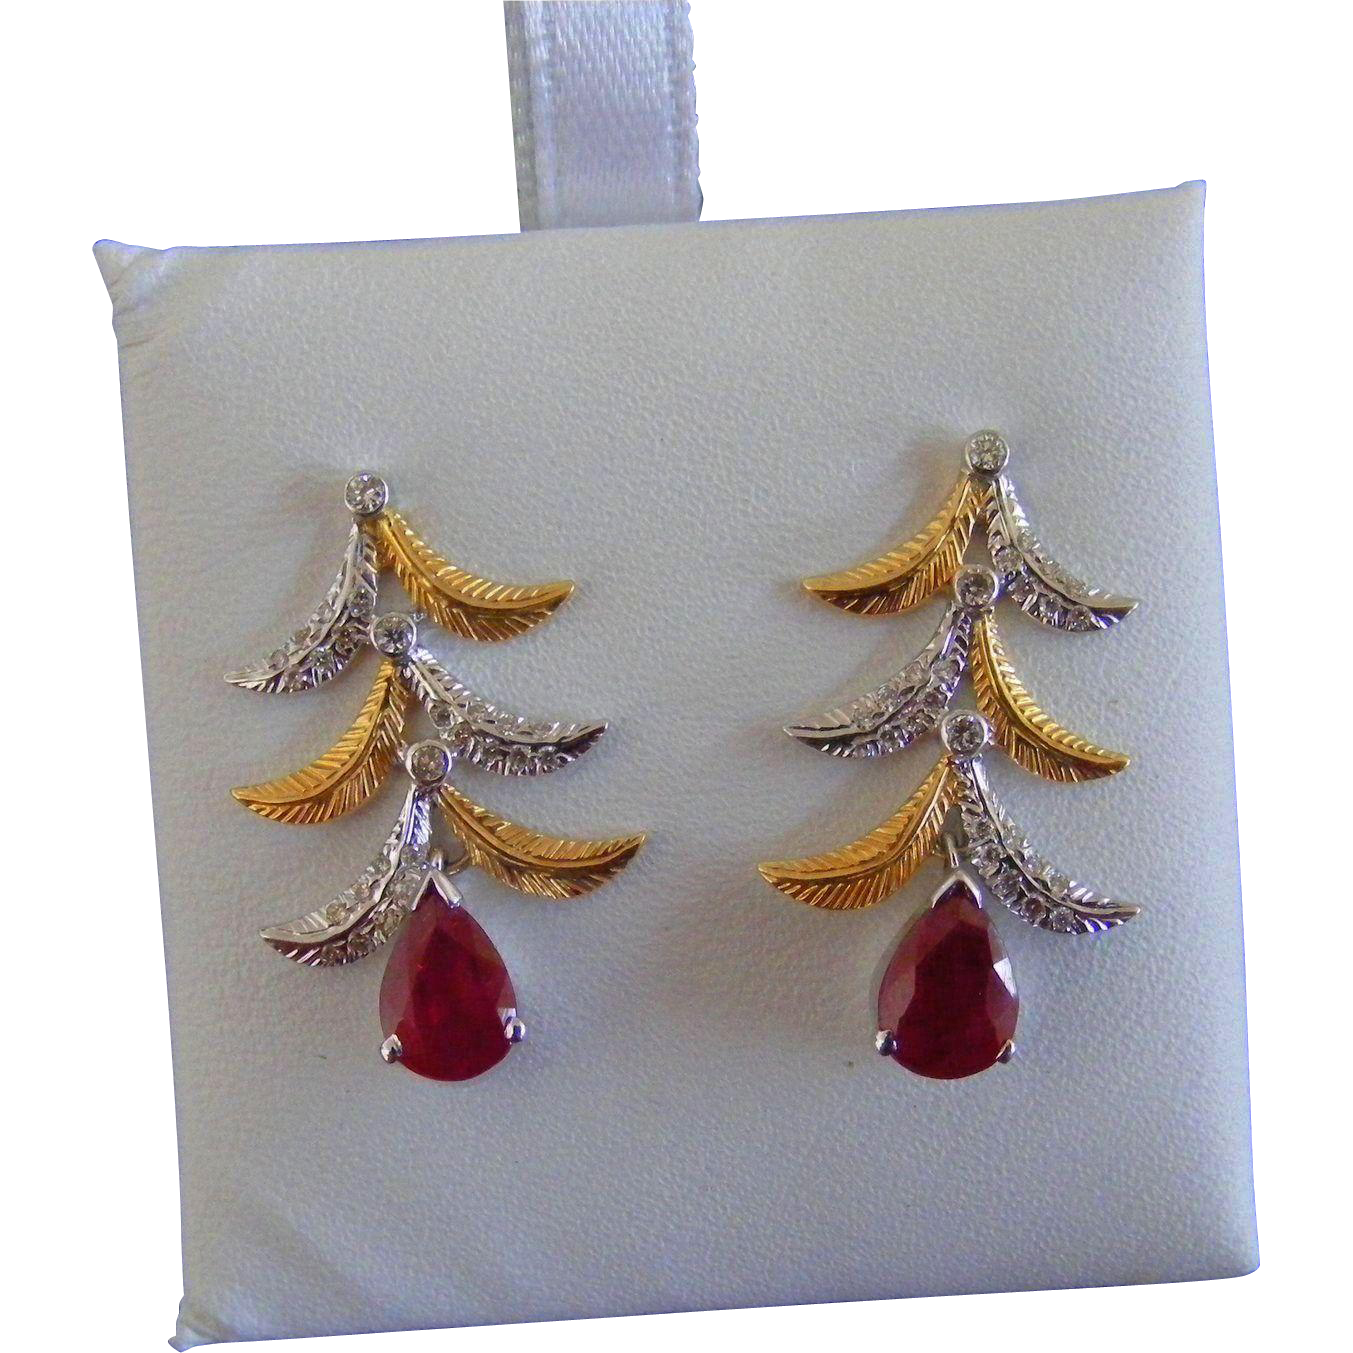 Vintage Ruby and Diamond Earrings, 18 k Gold